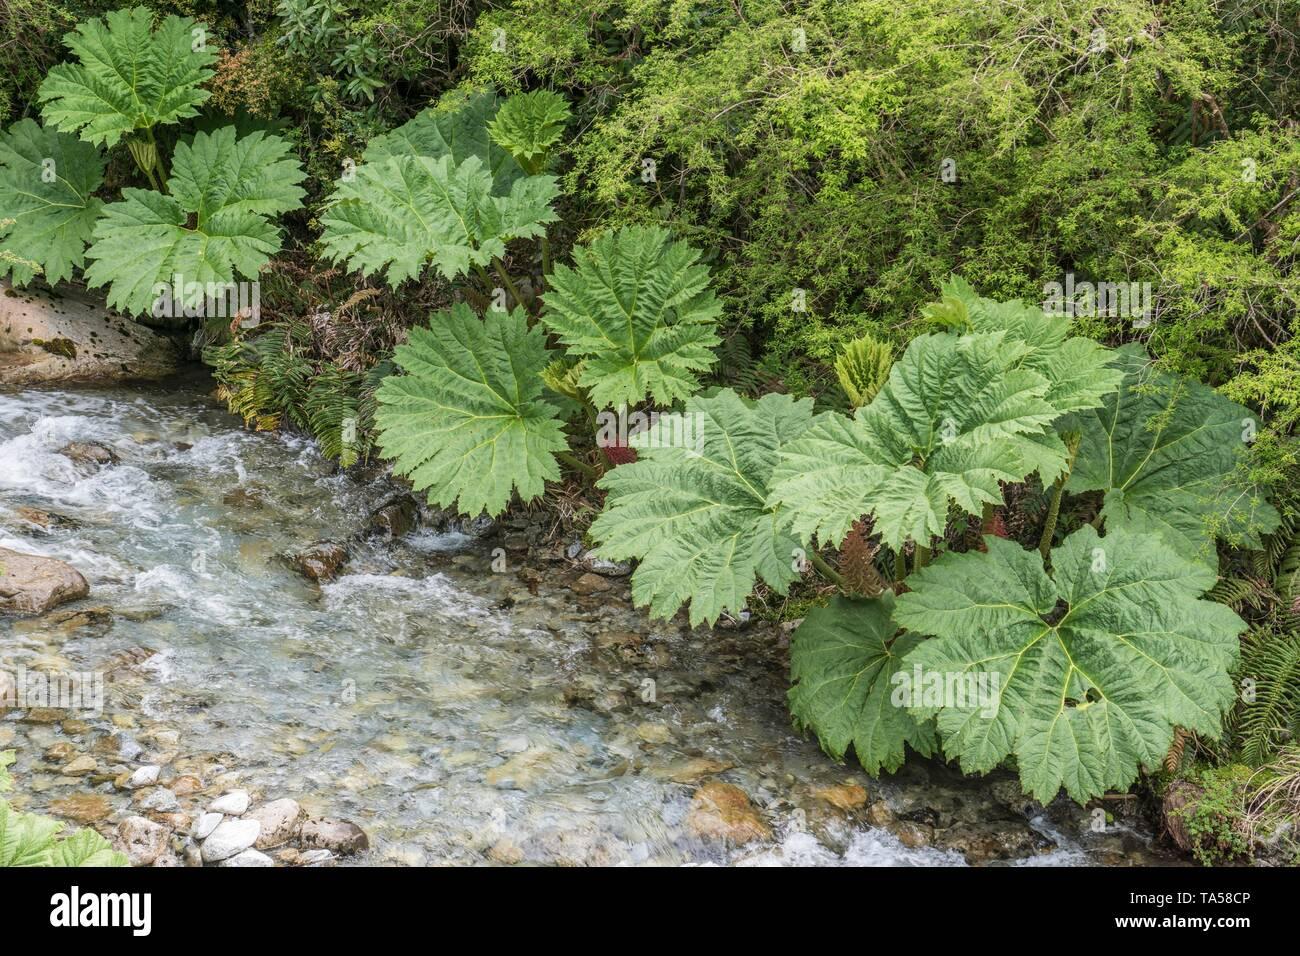 Pangue (Gunnera manicata) at the stream, Region de los Lagos, Patagonia, Chile Stock Photo